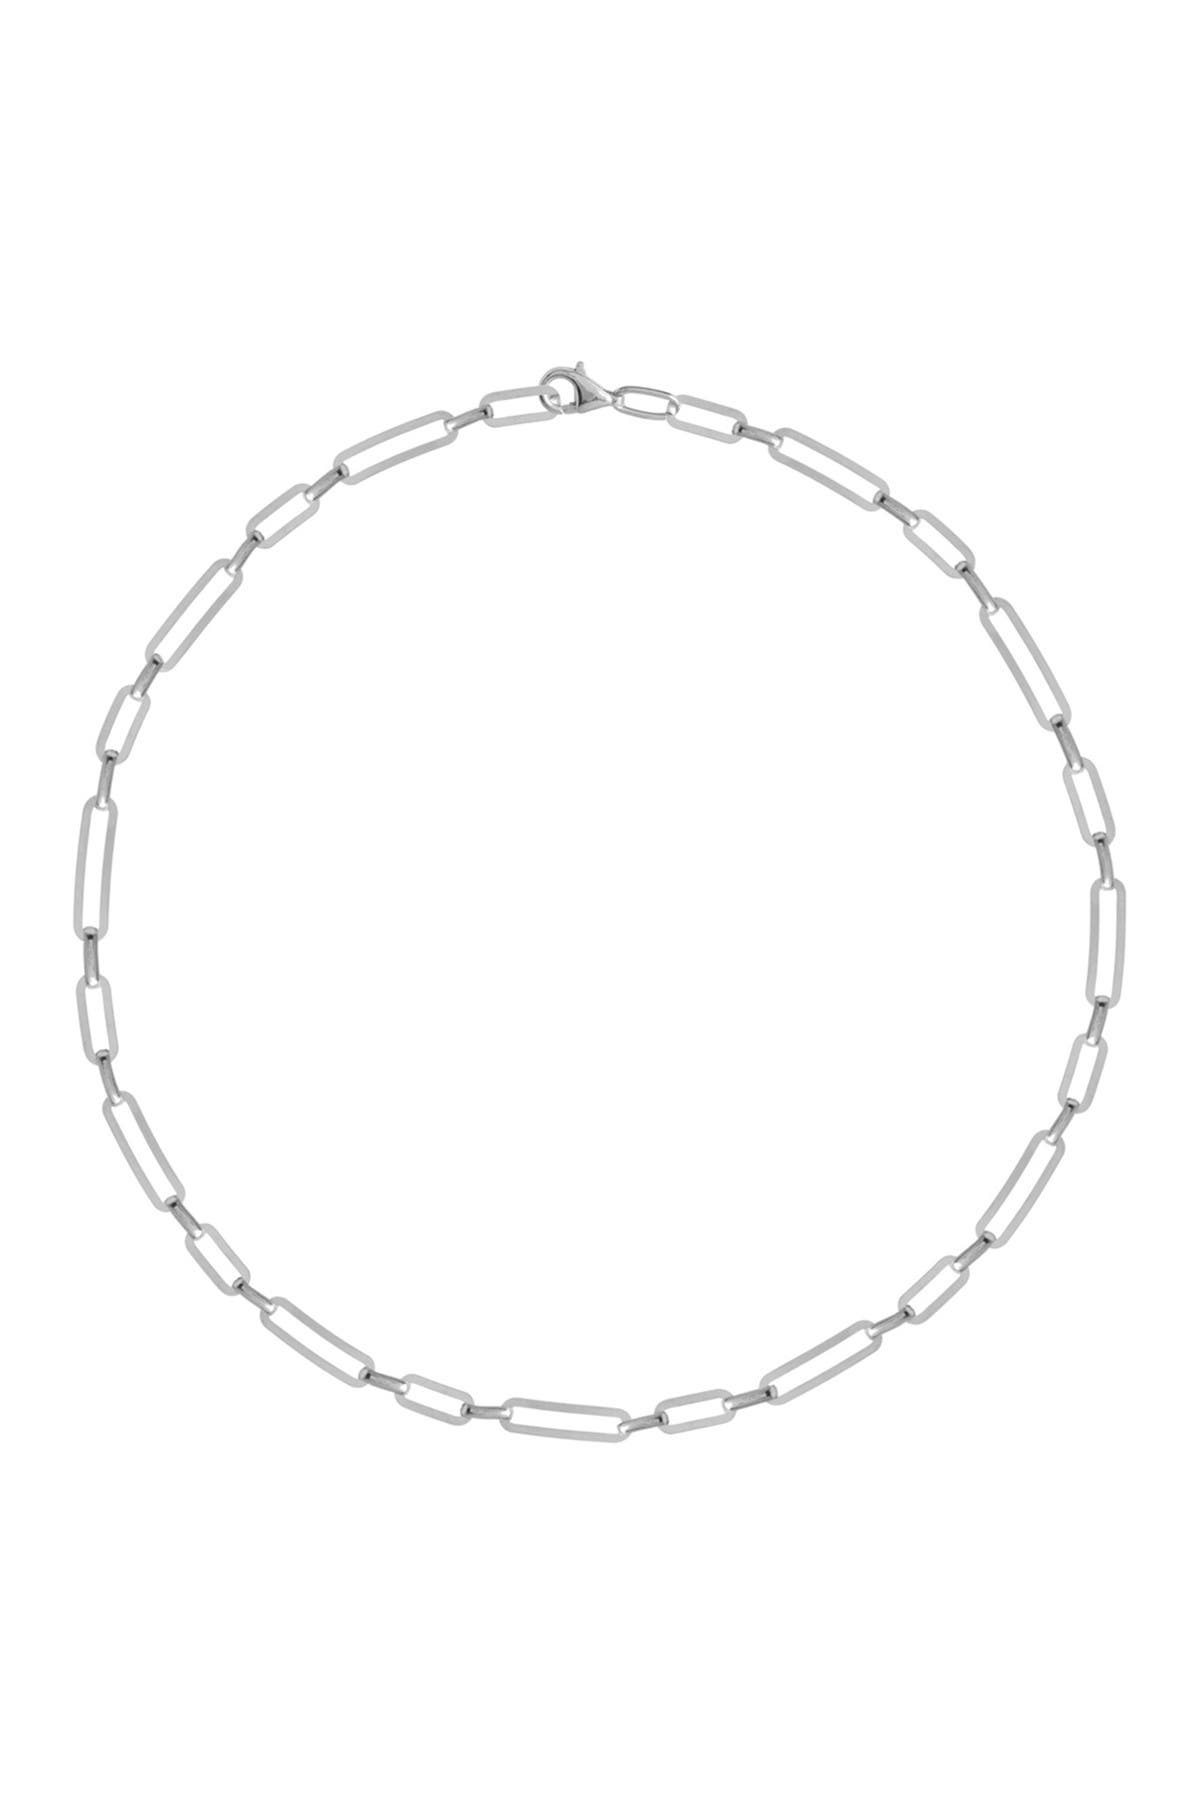 Image of Gabi Rielle Sterling Silver Box Chain Choker Necklace